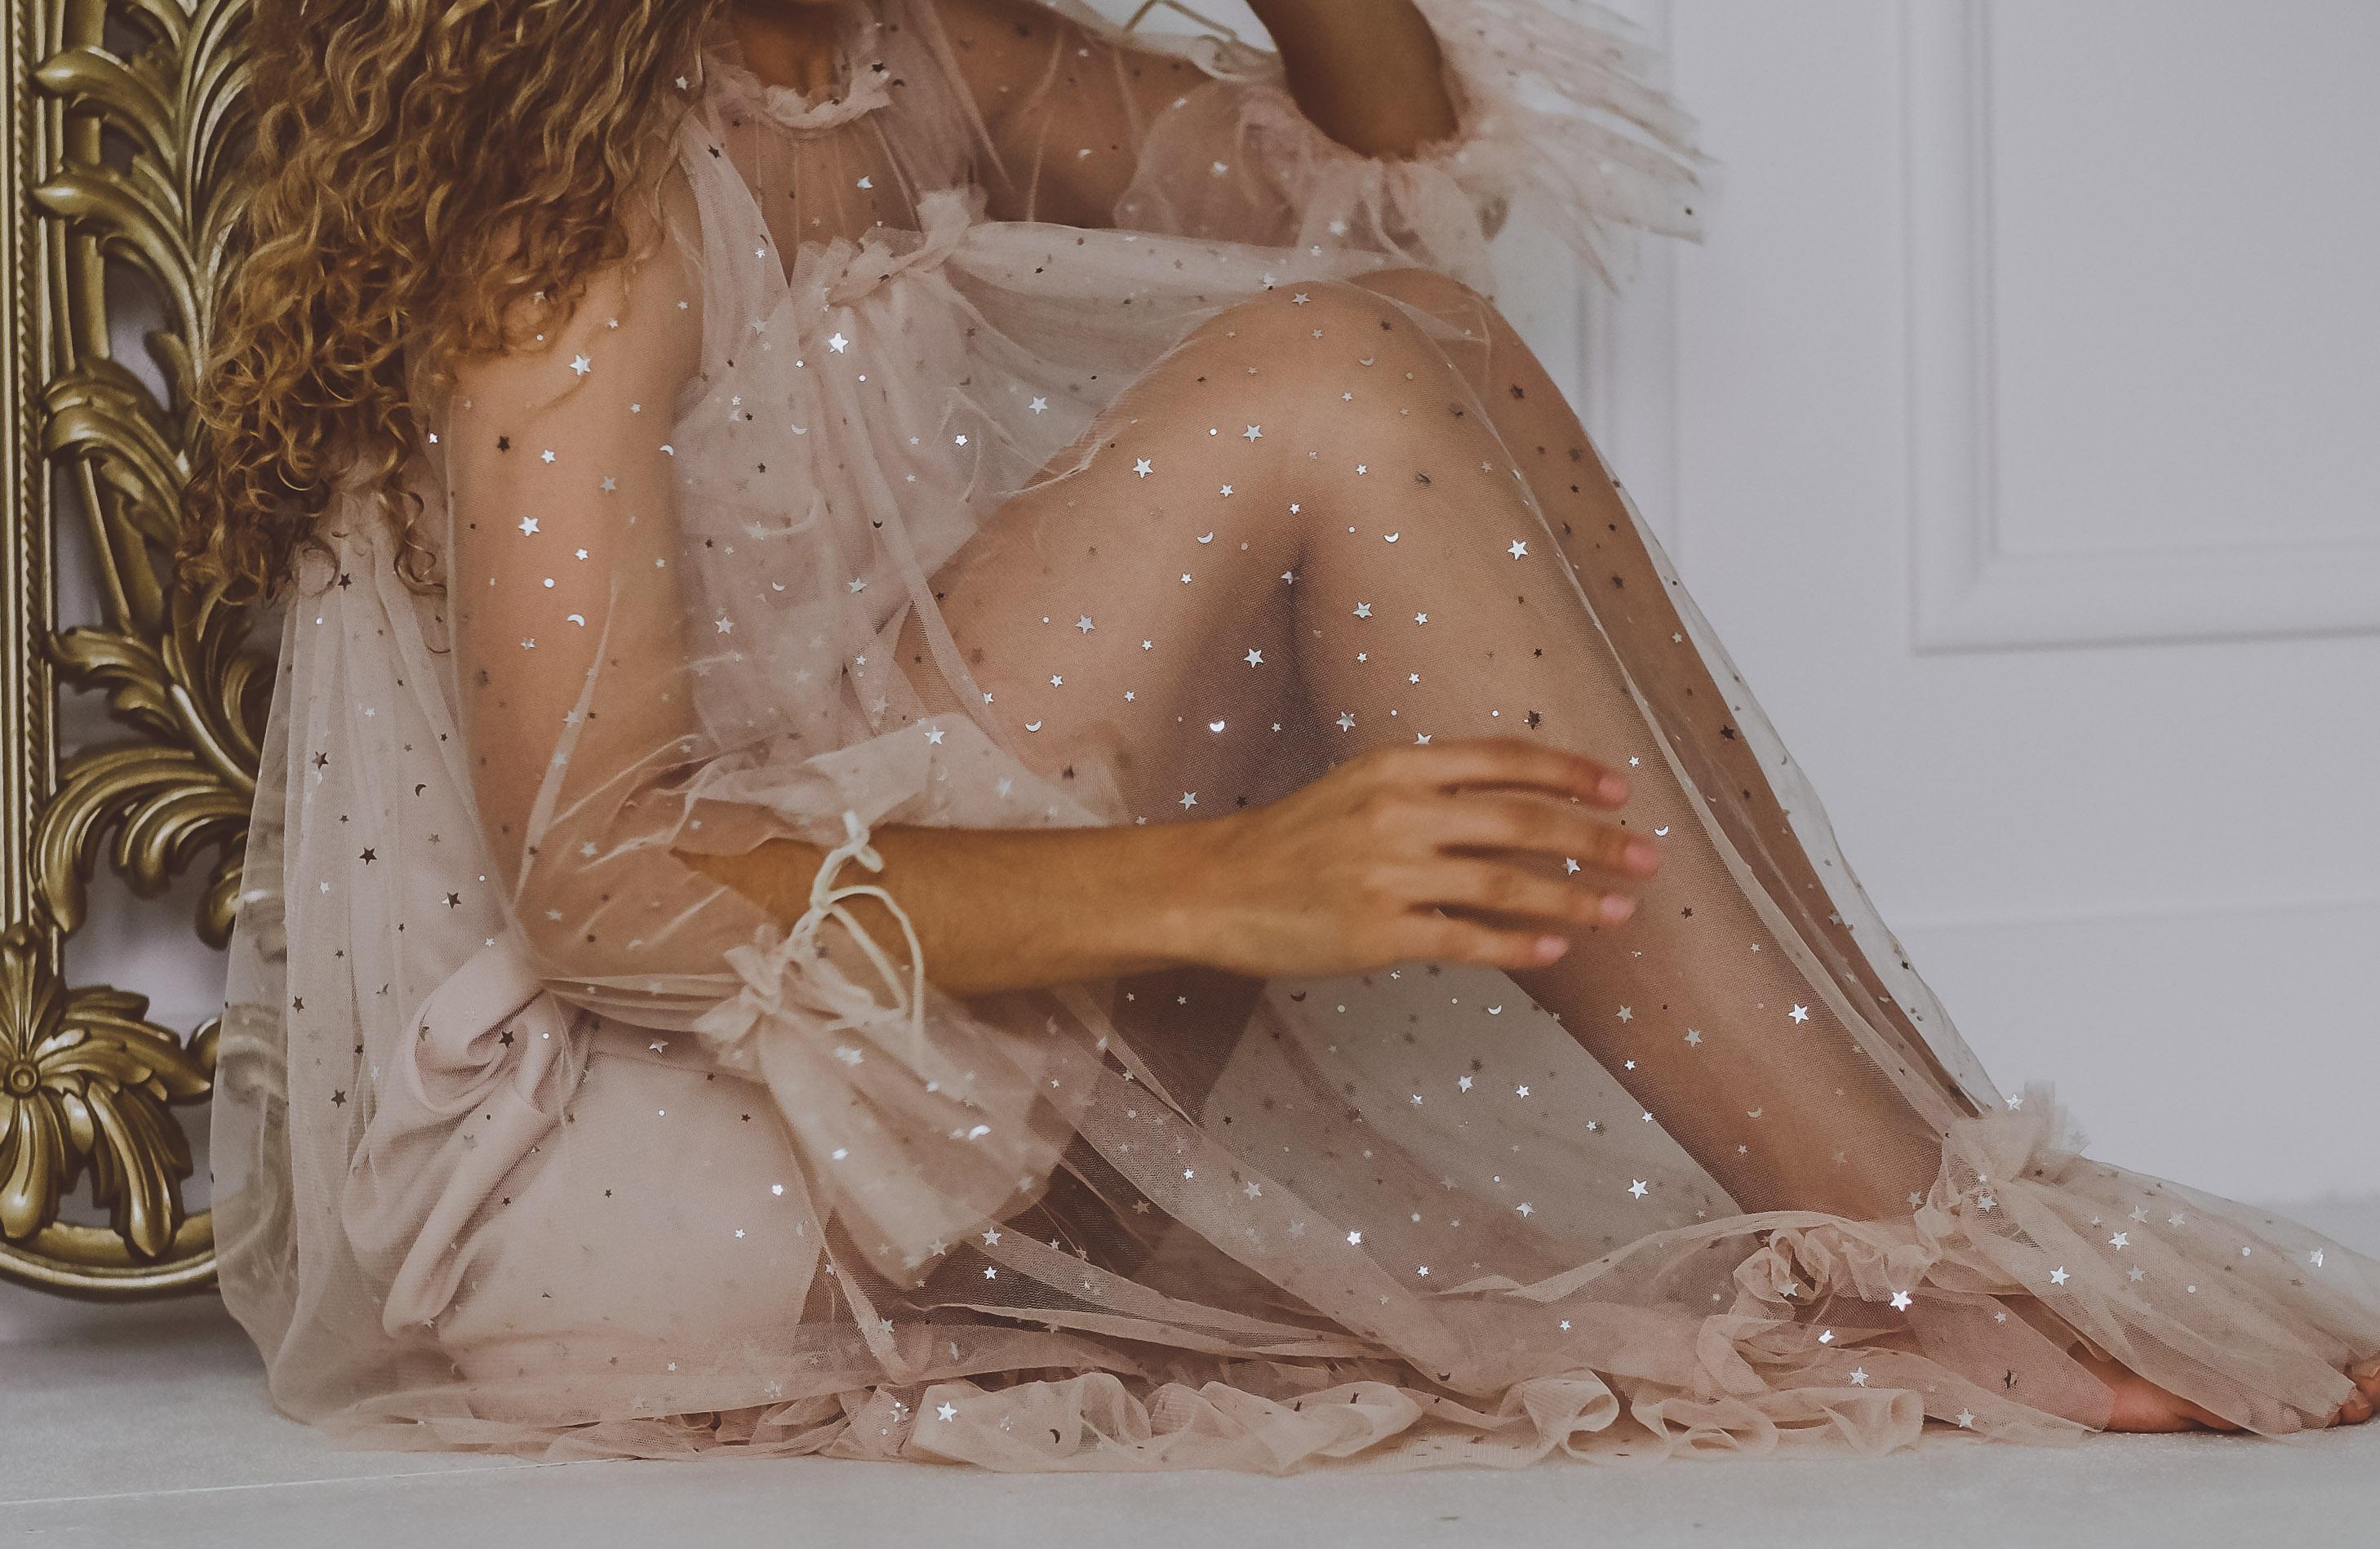 sparkly star dress